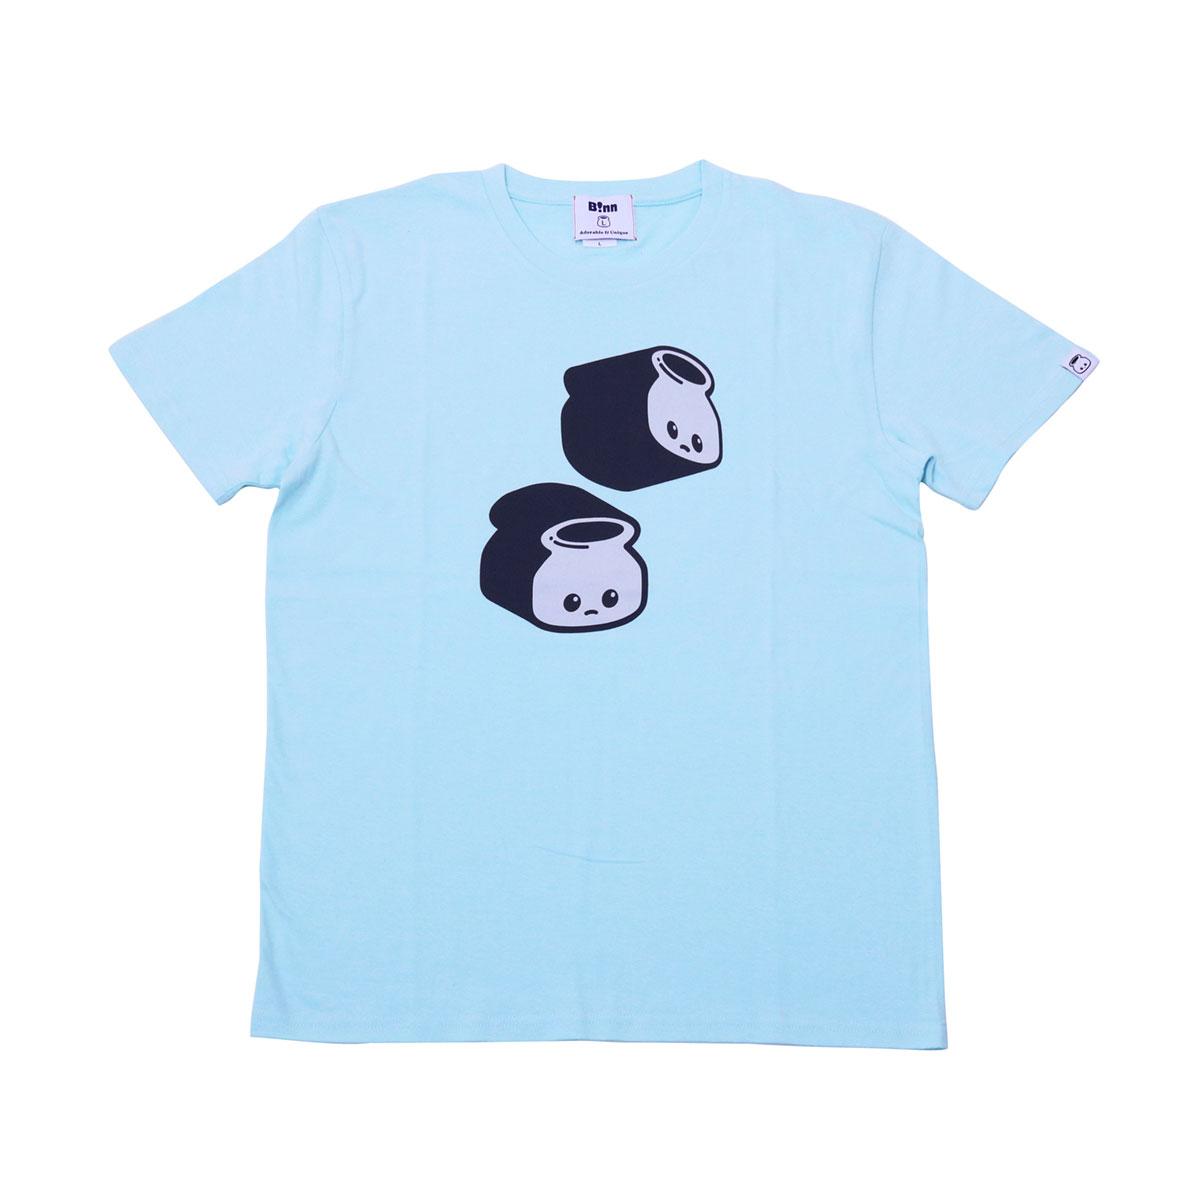 3D T-Shirts (LightBlue)